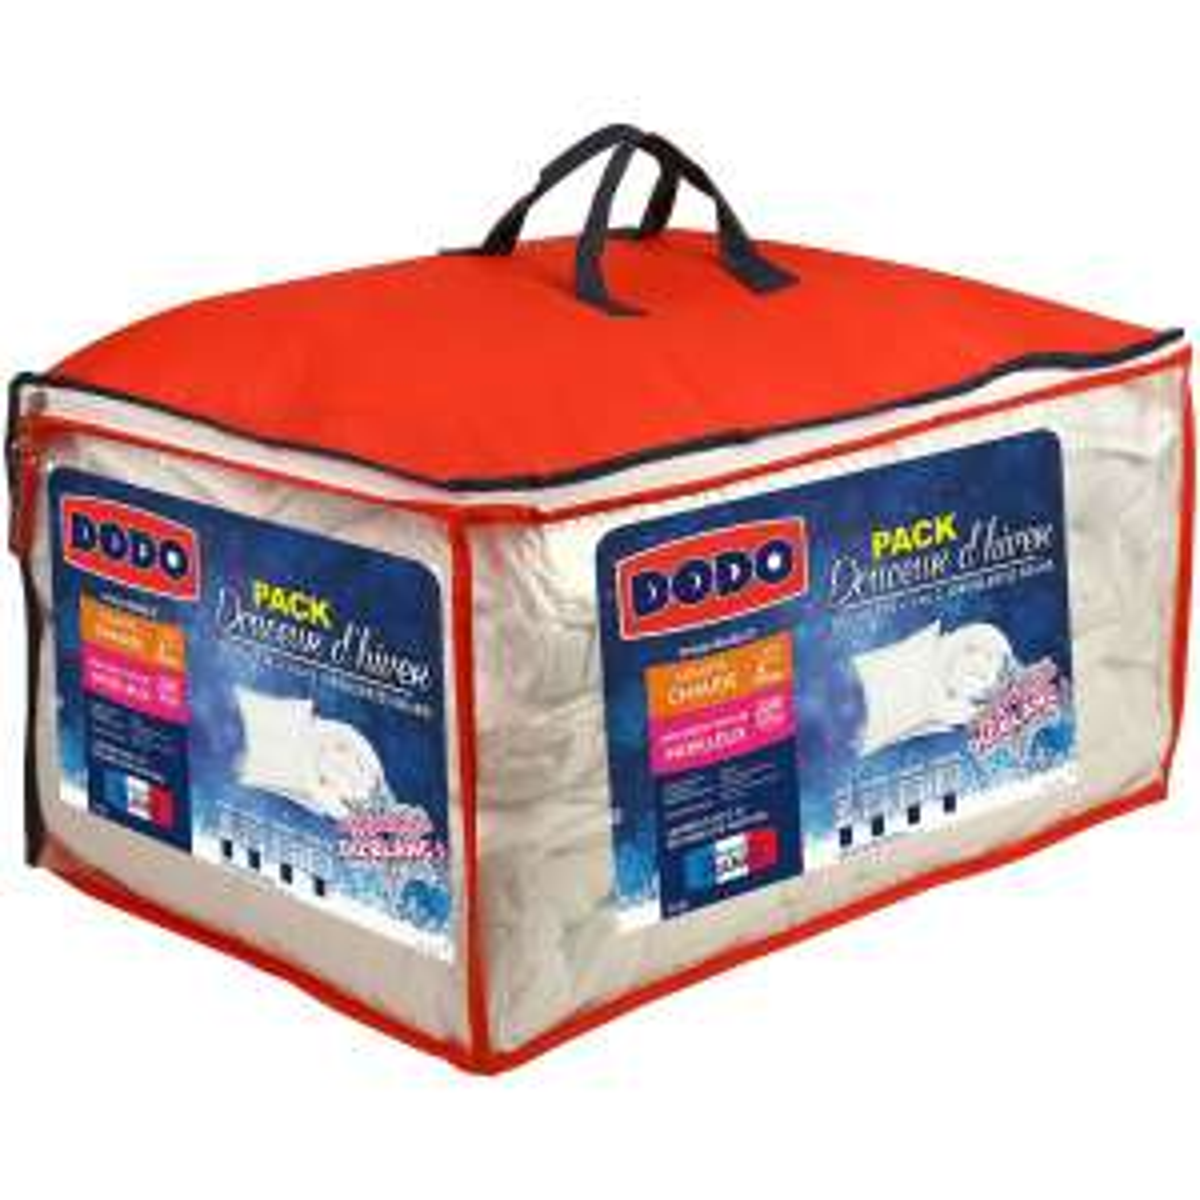 Pack couette chaude Dodo + 2 oreillers moelleux - 260x240 cm